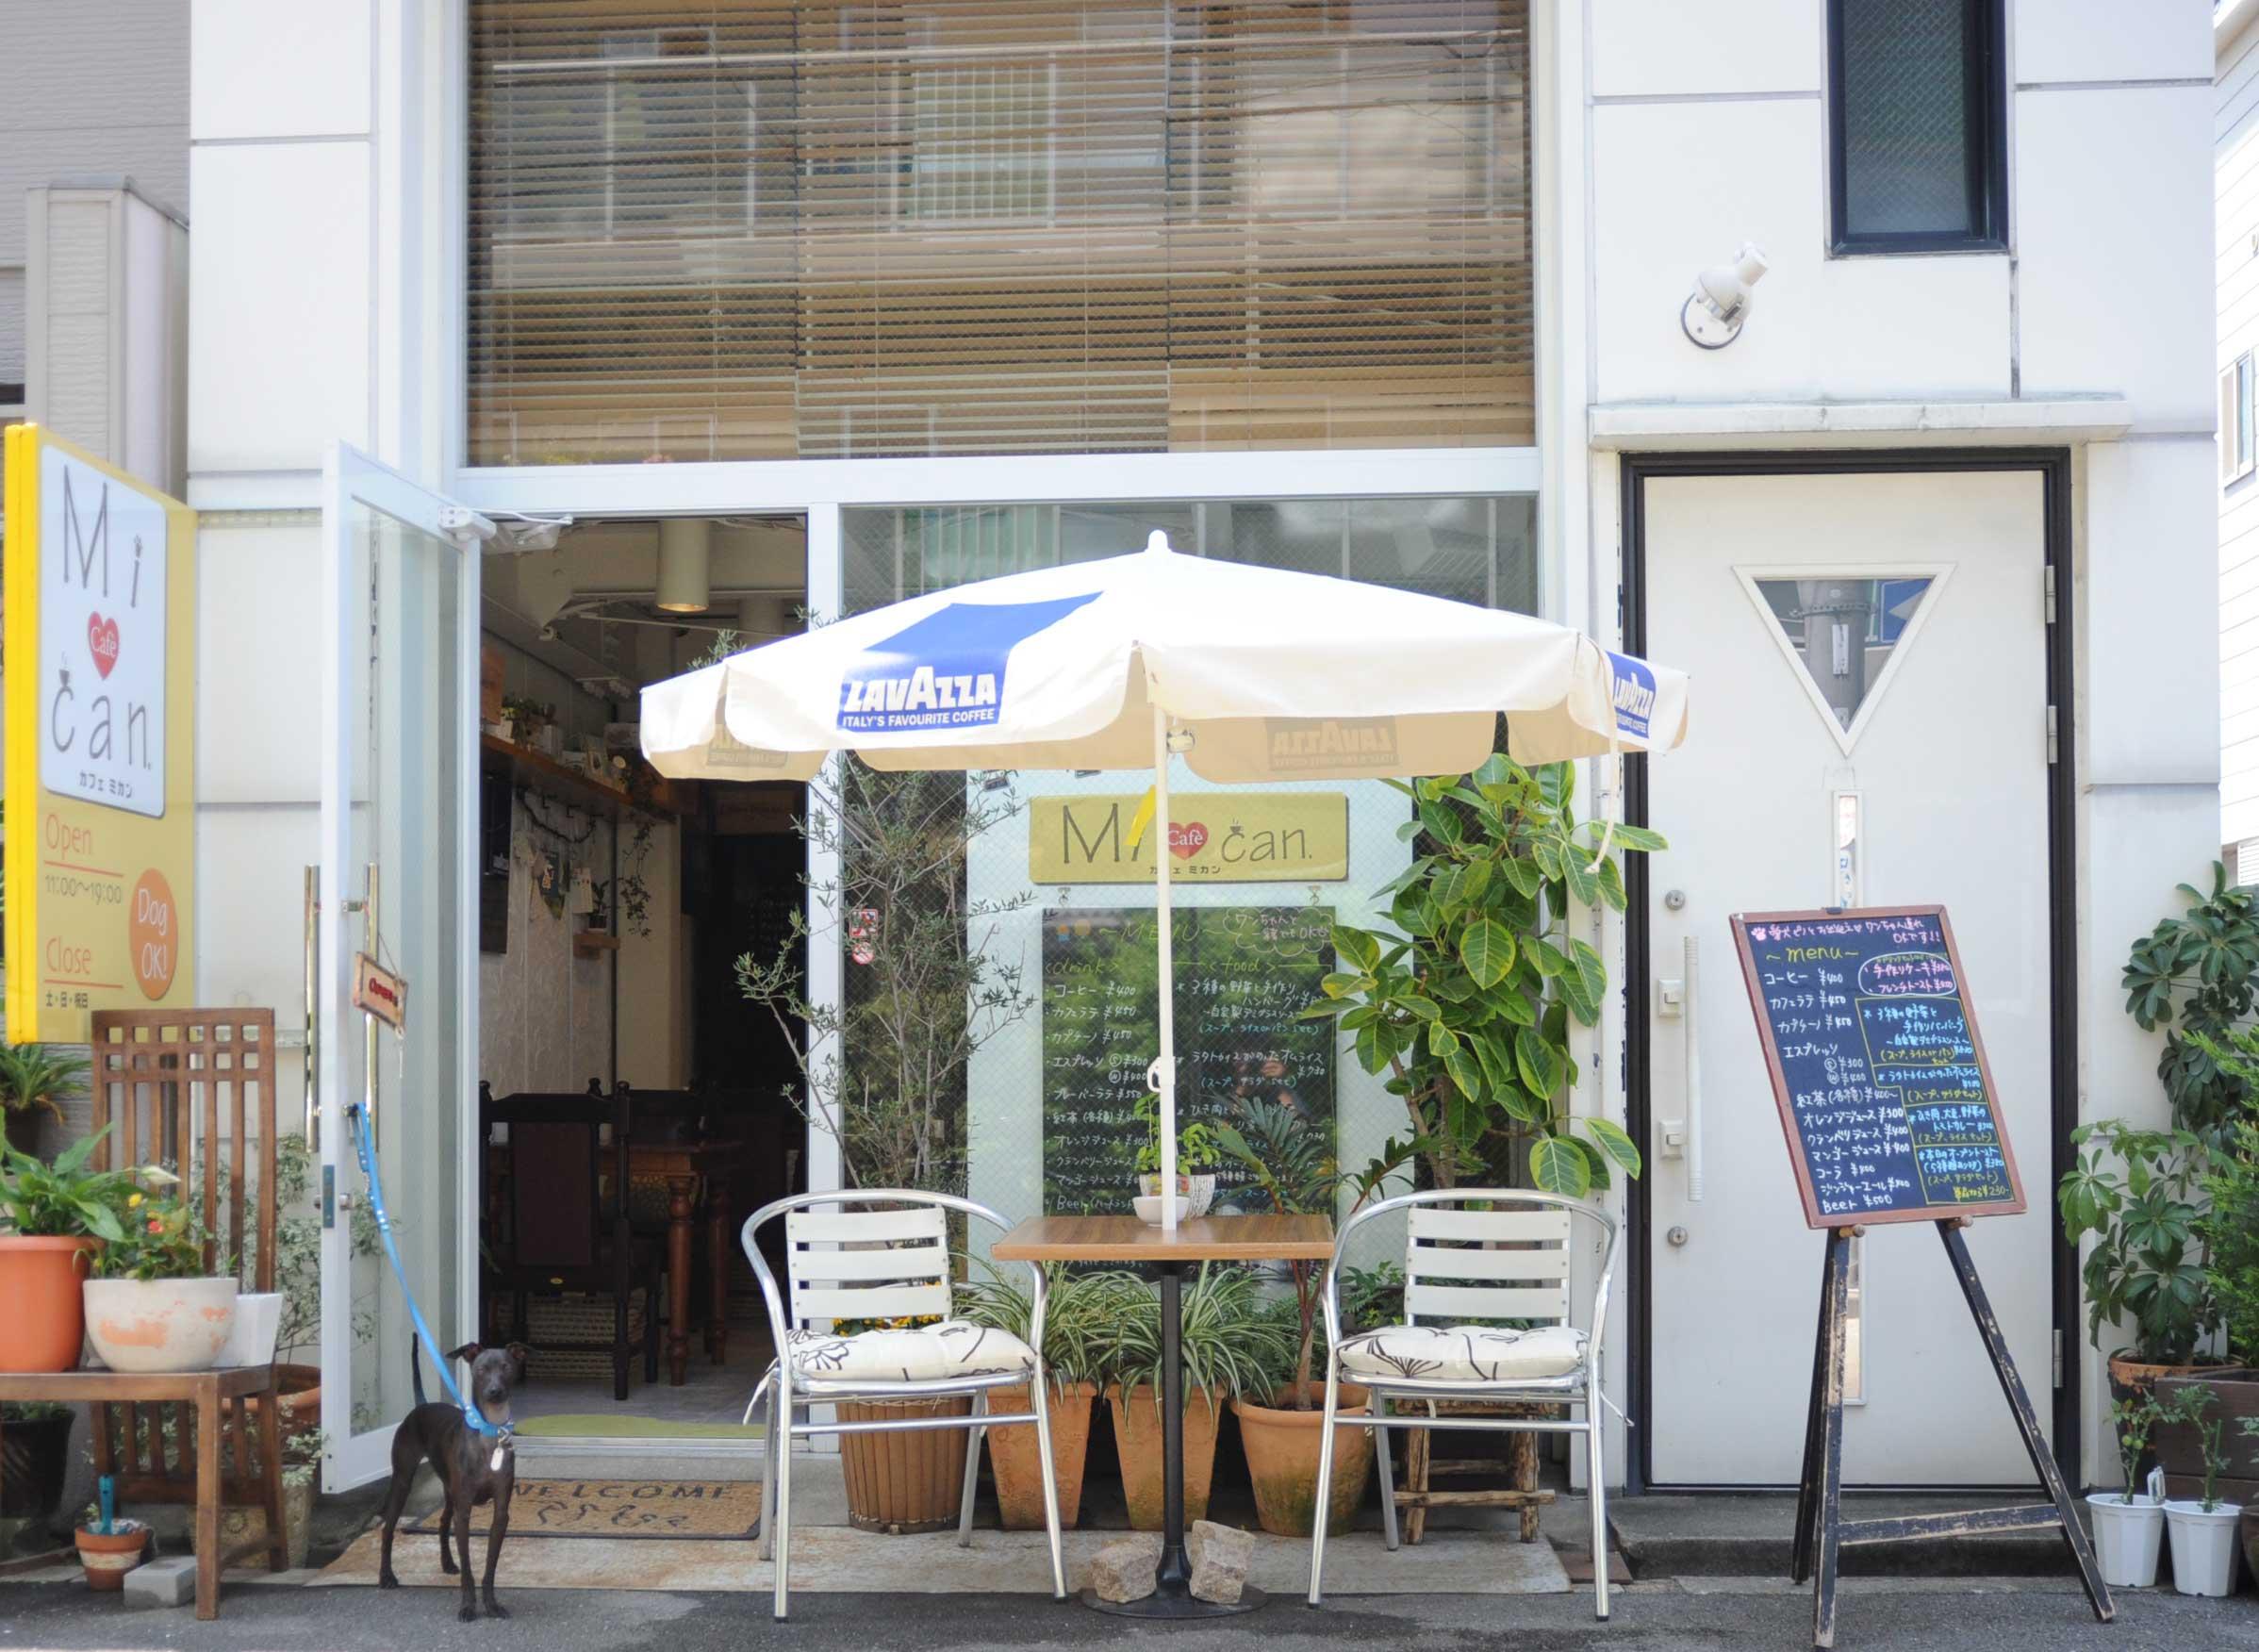 cafe Mi-Can